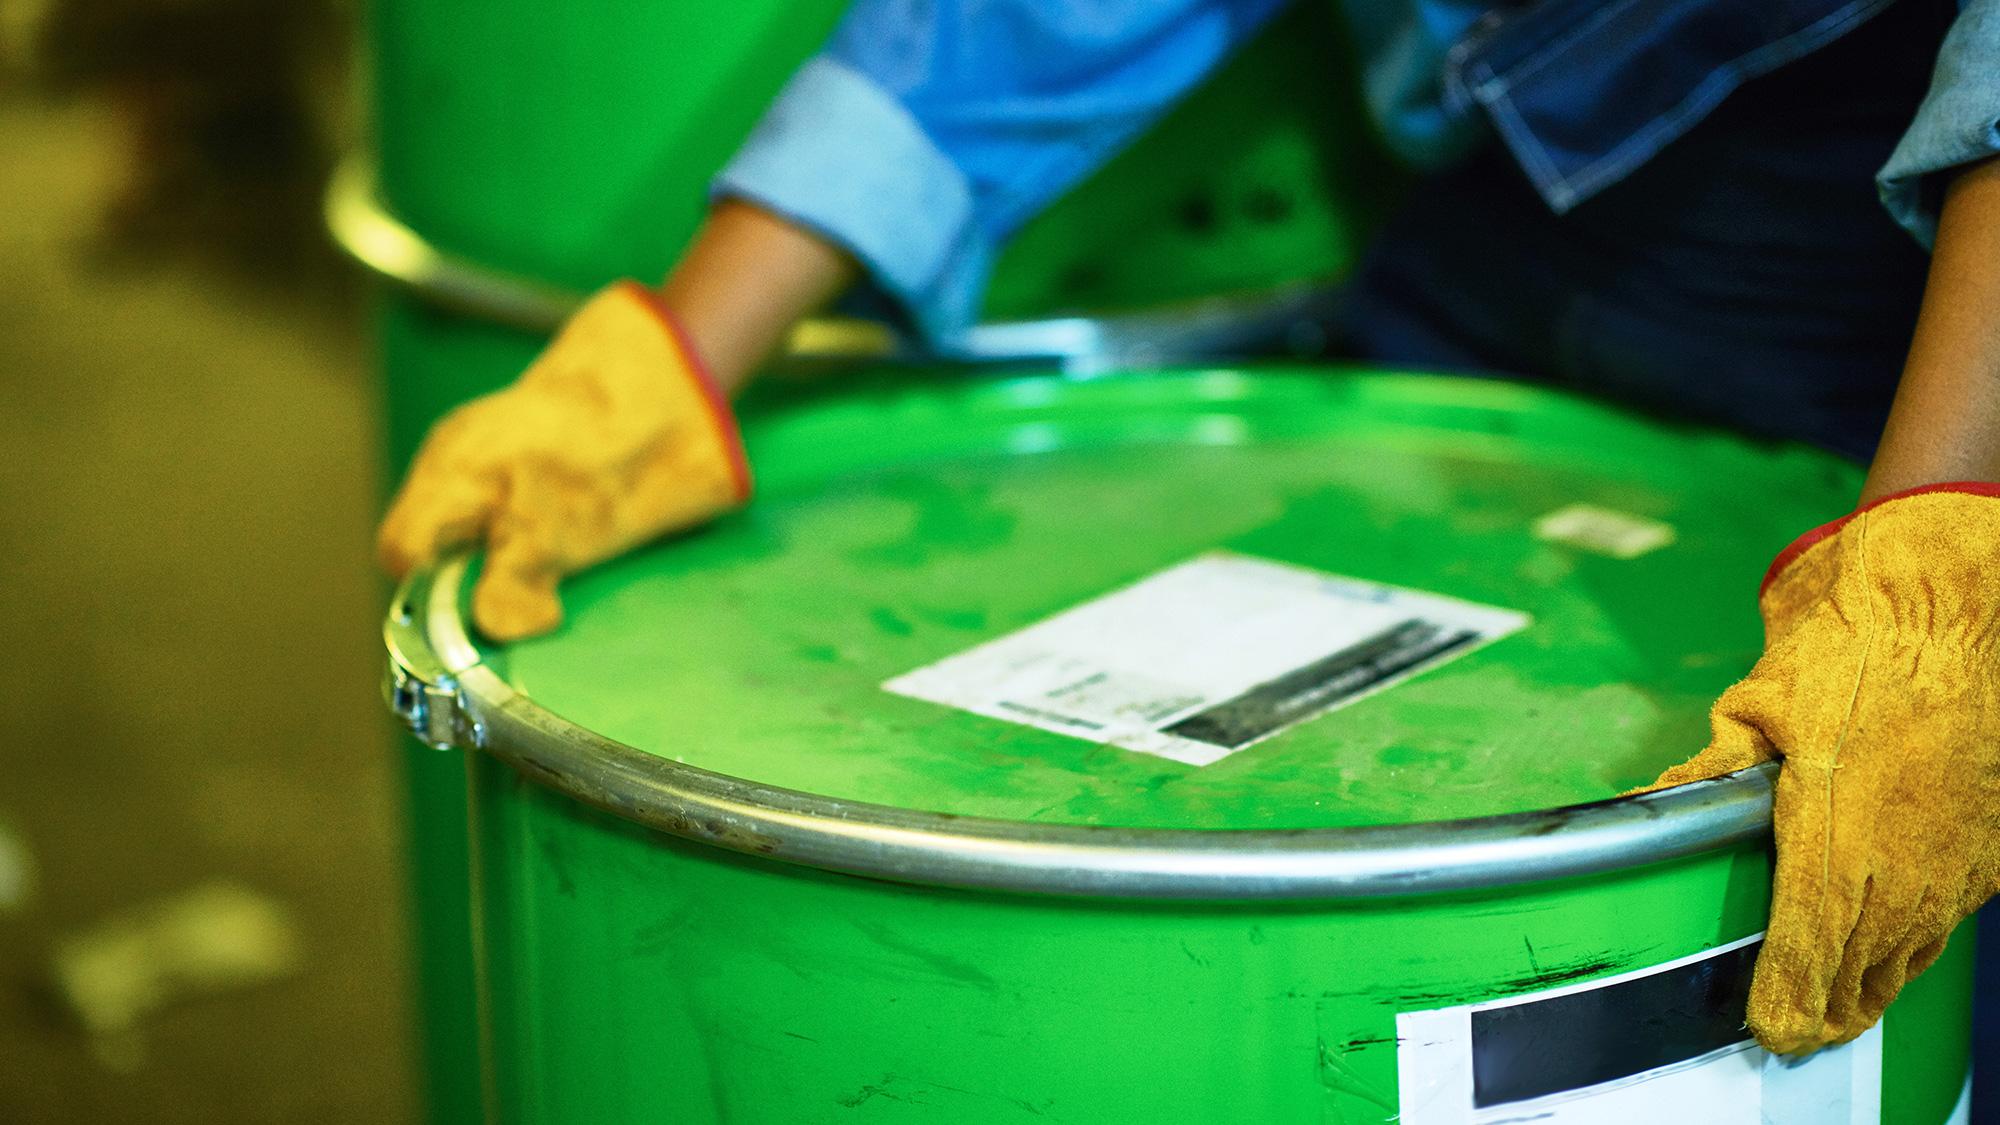 Barrel of hydrocarbon waste